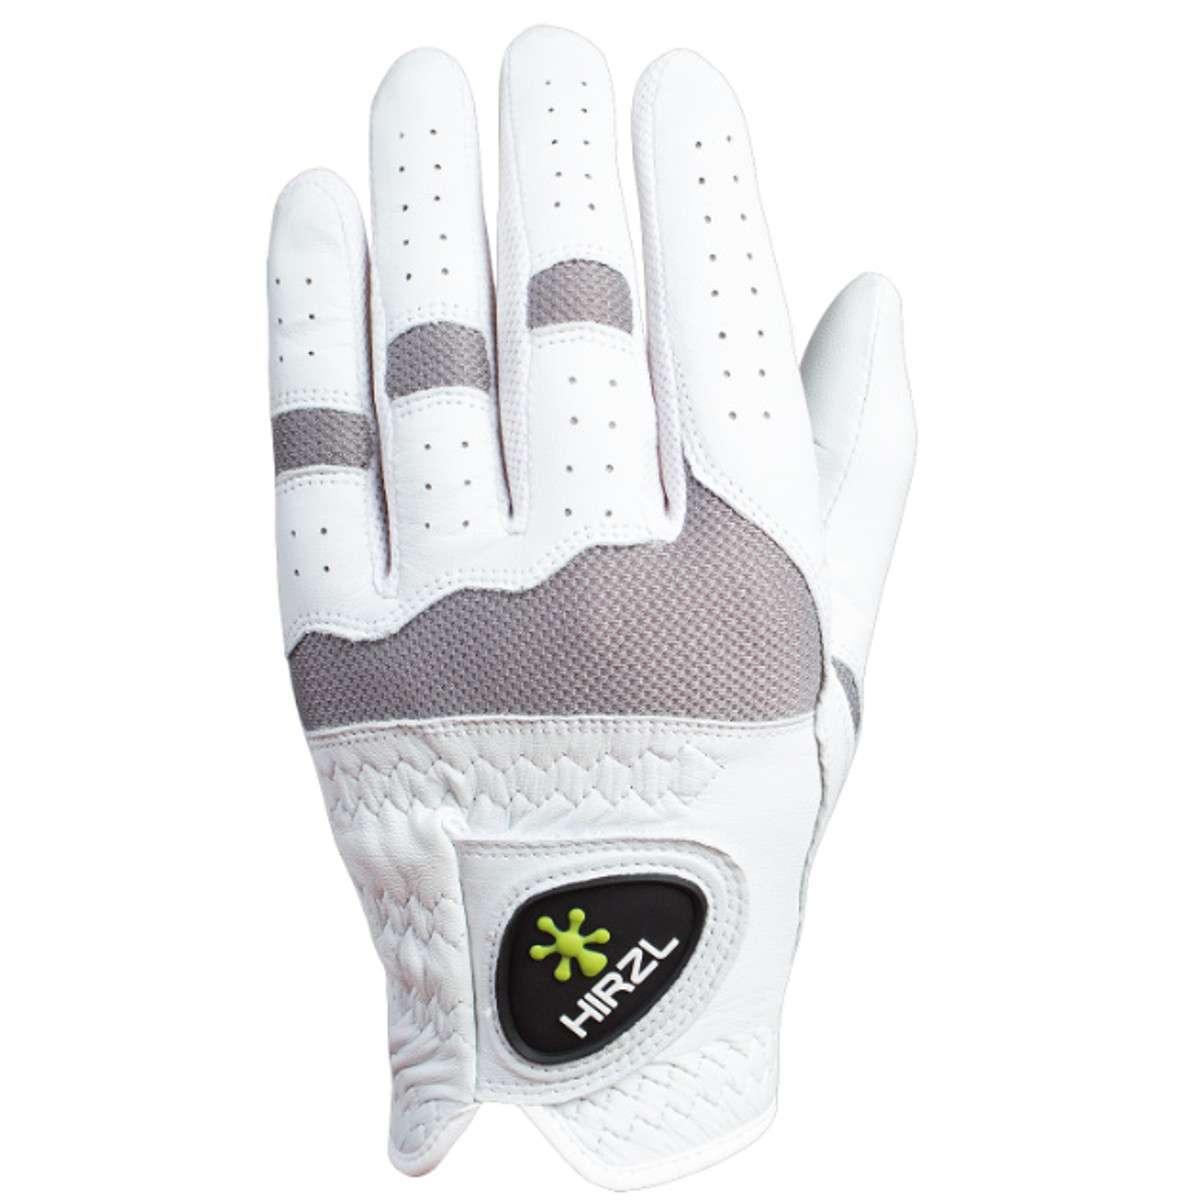 huge discount 975f7 1fc57 Hirzl Challenger Golfhandschuh, Herren - Links getragen günstig kaufen   Golflädchen